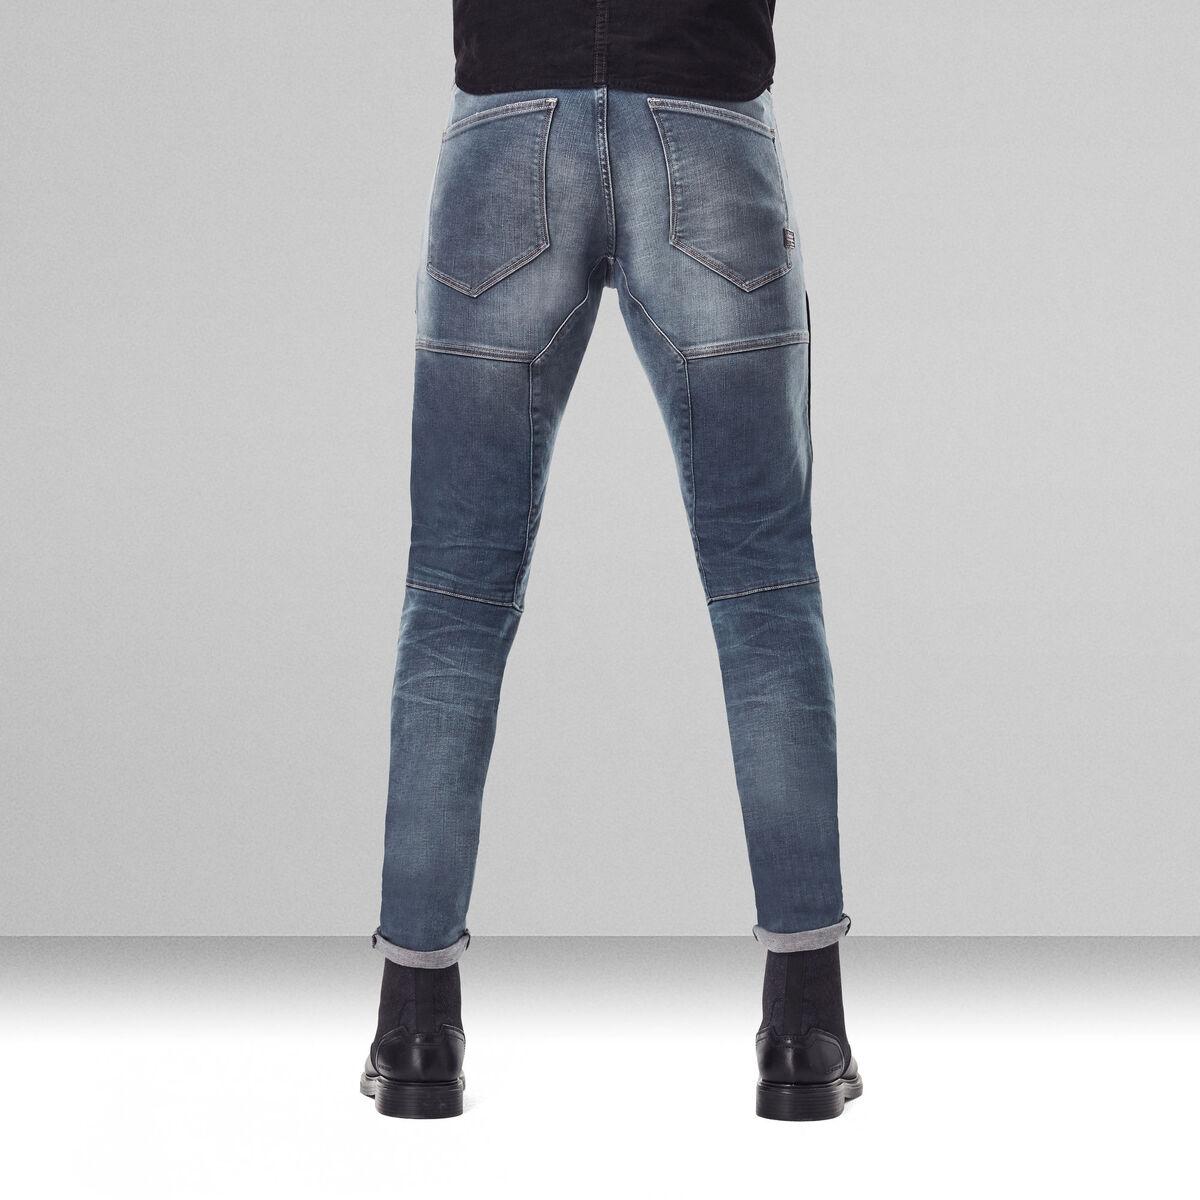 Bild 2 von Rackam 3D Skinny Jeans